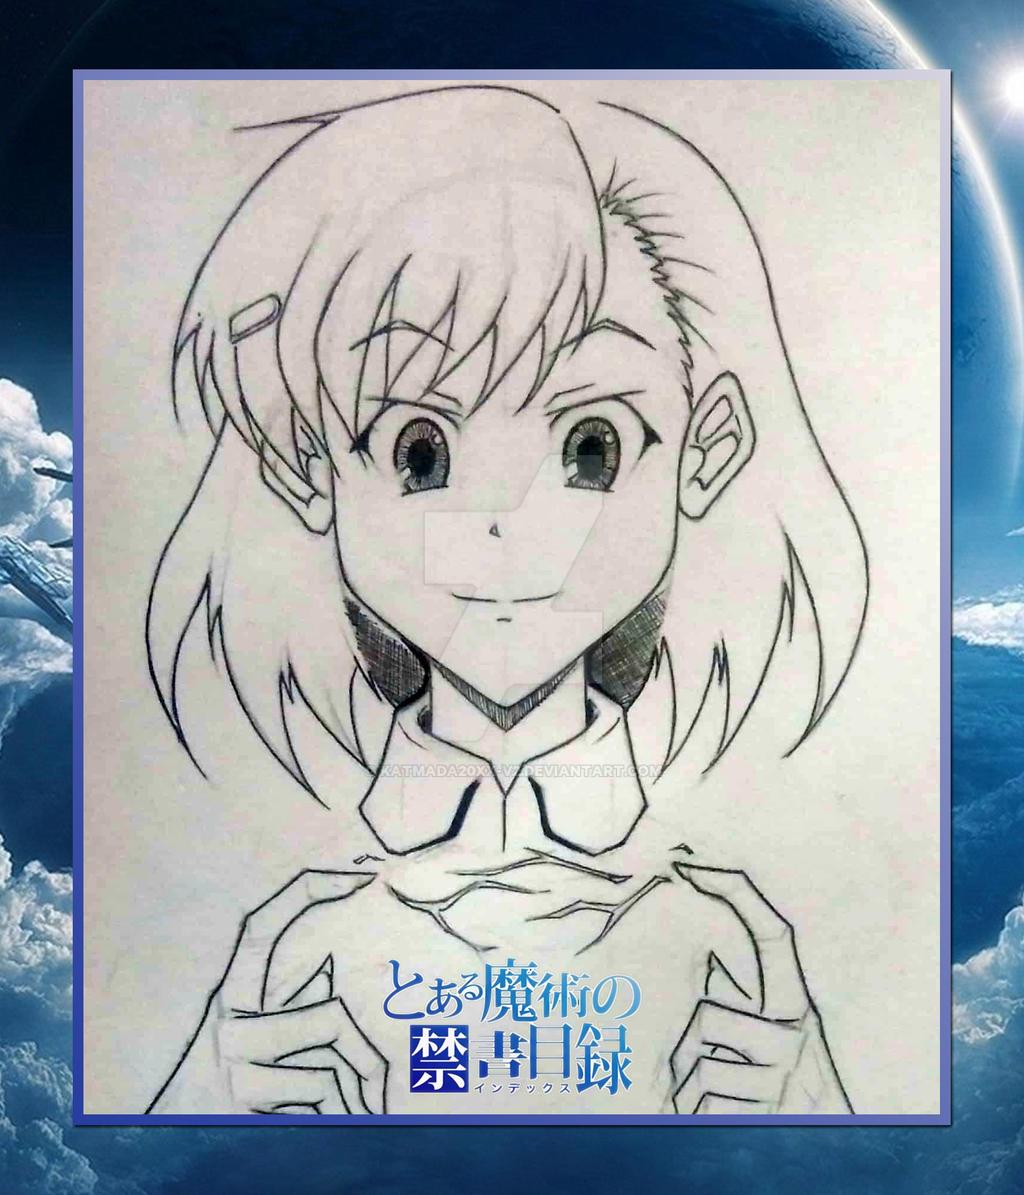 Misaka Mikoto Of Toaru Majutsu No Index By Katmada20xx-V2